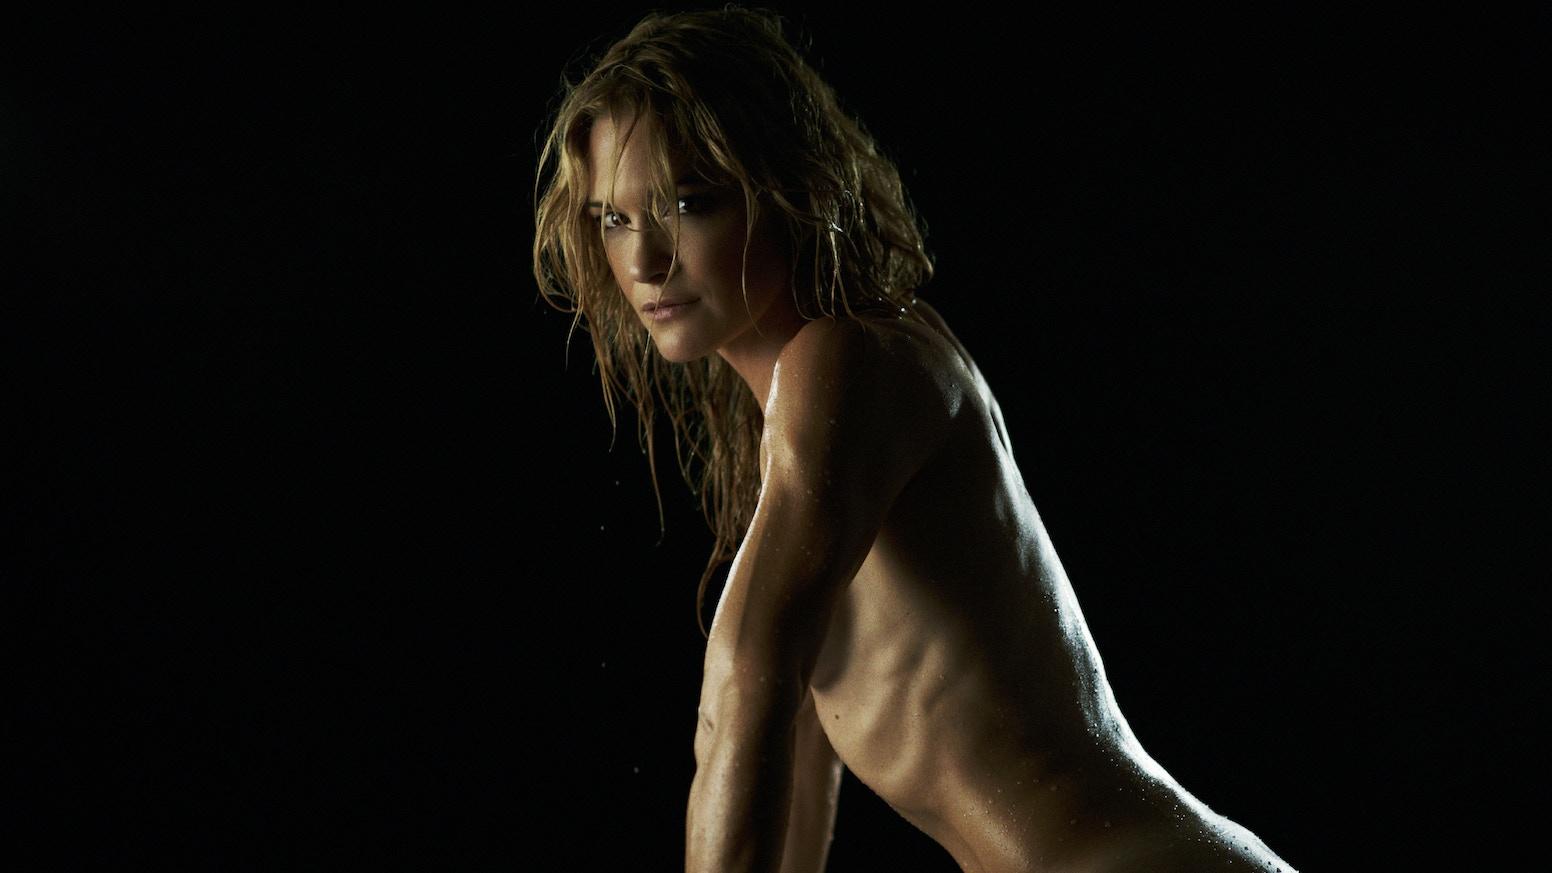 Andrea Osvárt Nuda in the tubtj scott — kickstarter